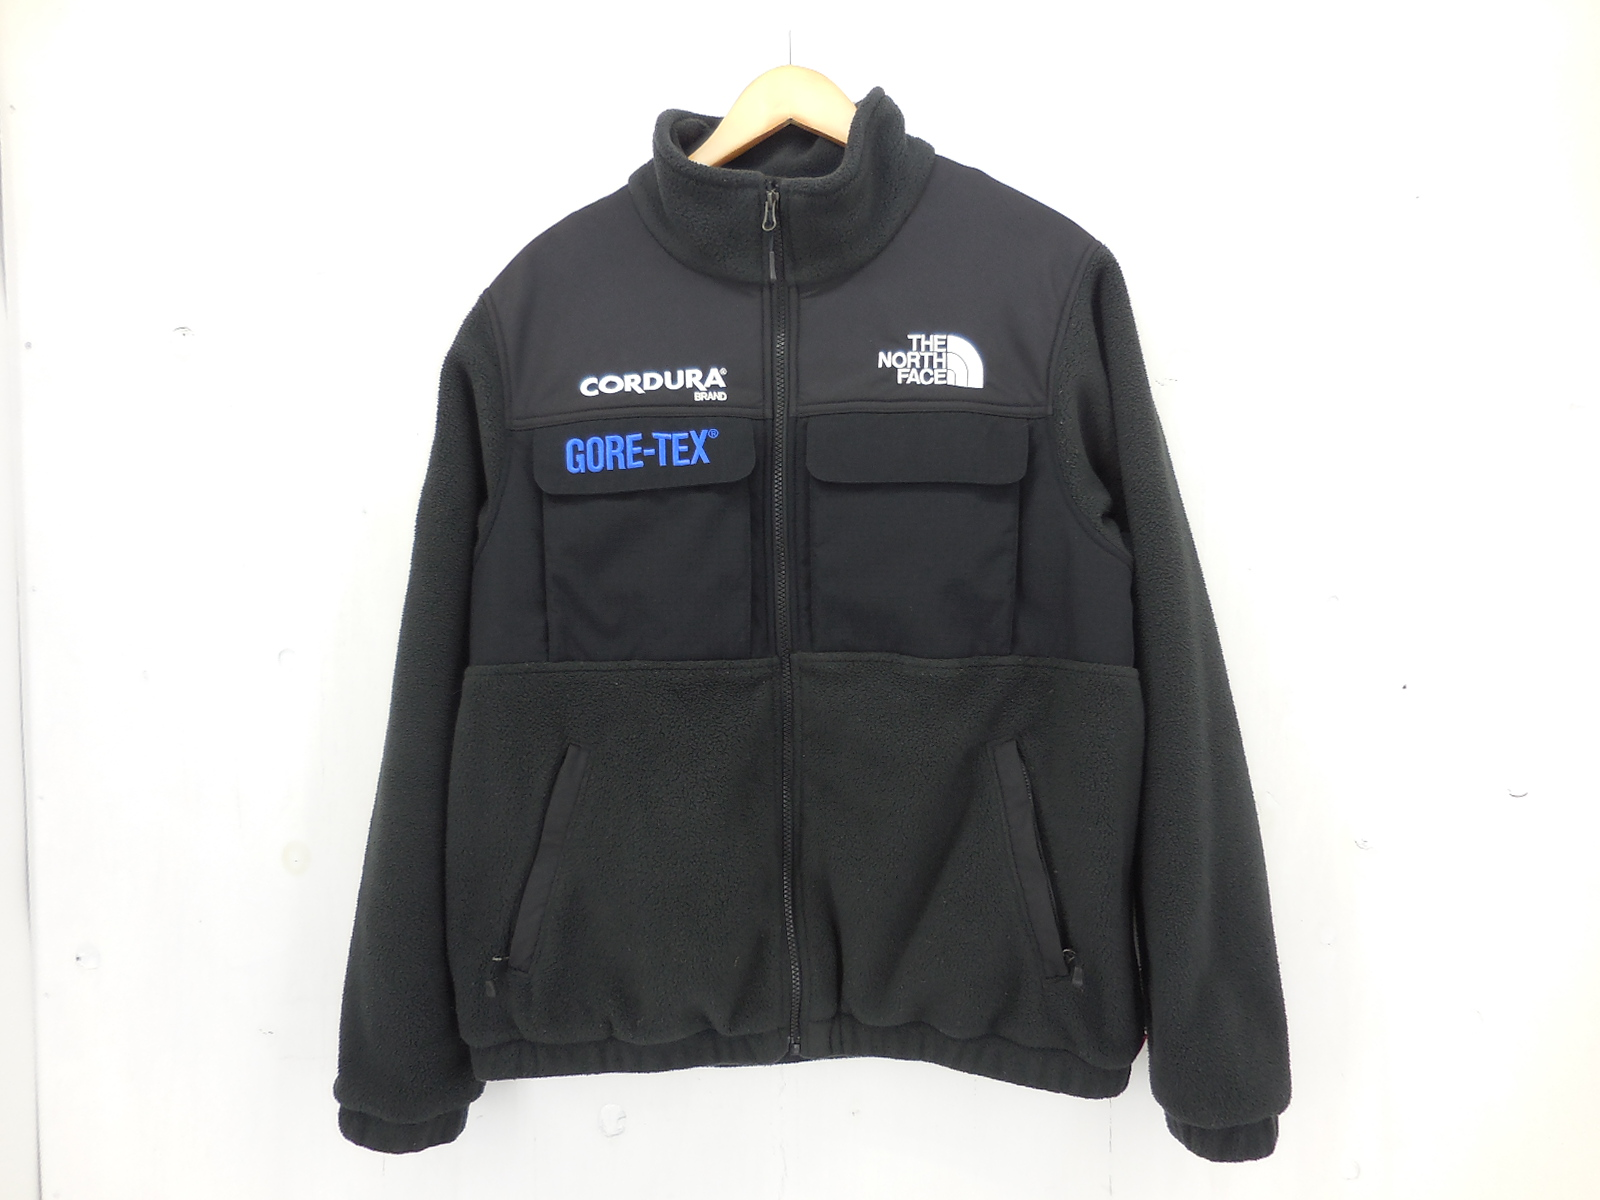 Supreme × THE MORTH FACE 18AW Expedition Fleece Jacket size:M シュプリーム ザ・ノース・フェイス GORE-TEX ブラック ノースフェイス NL718091